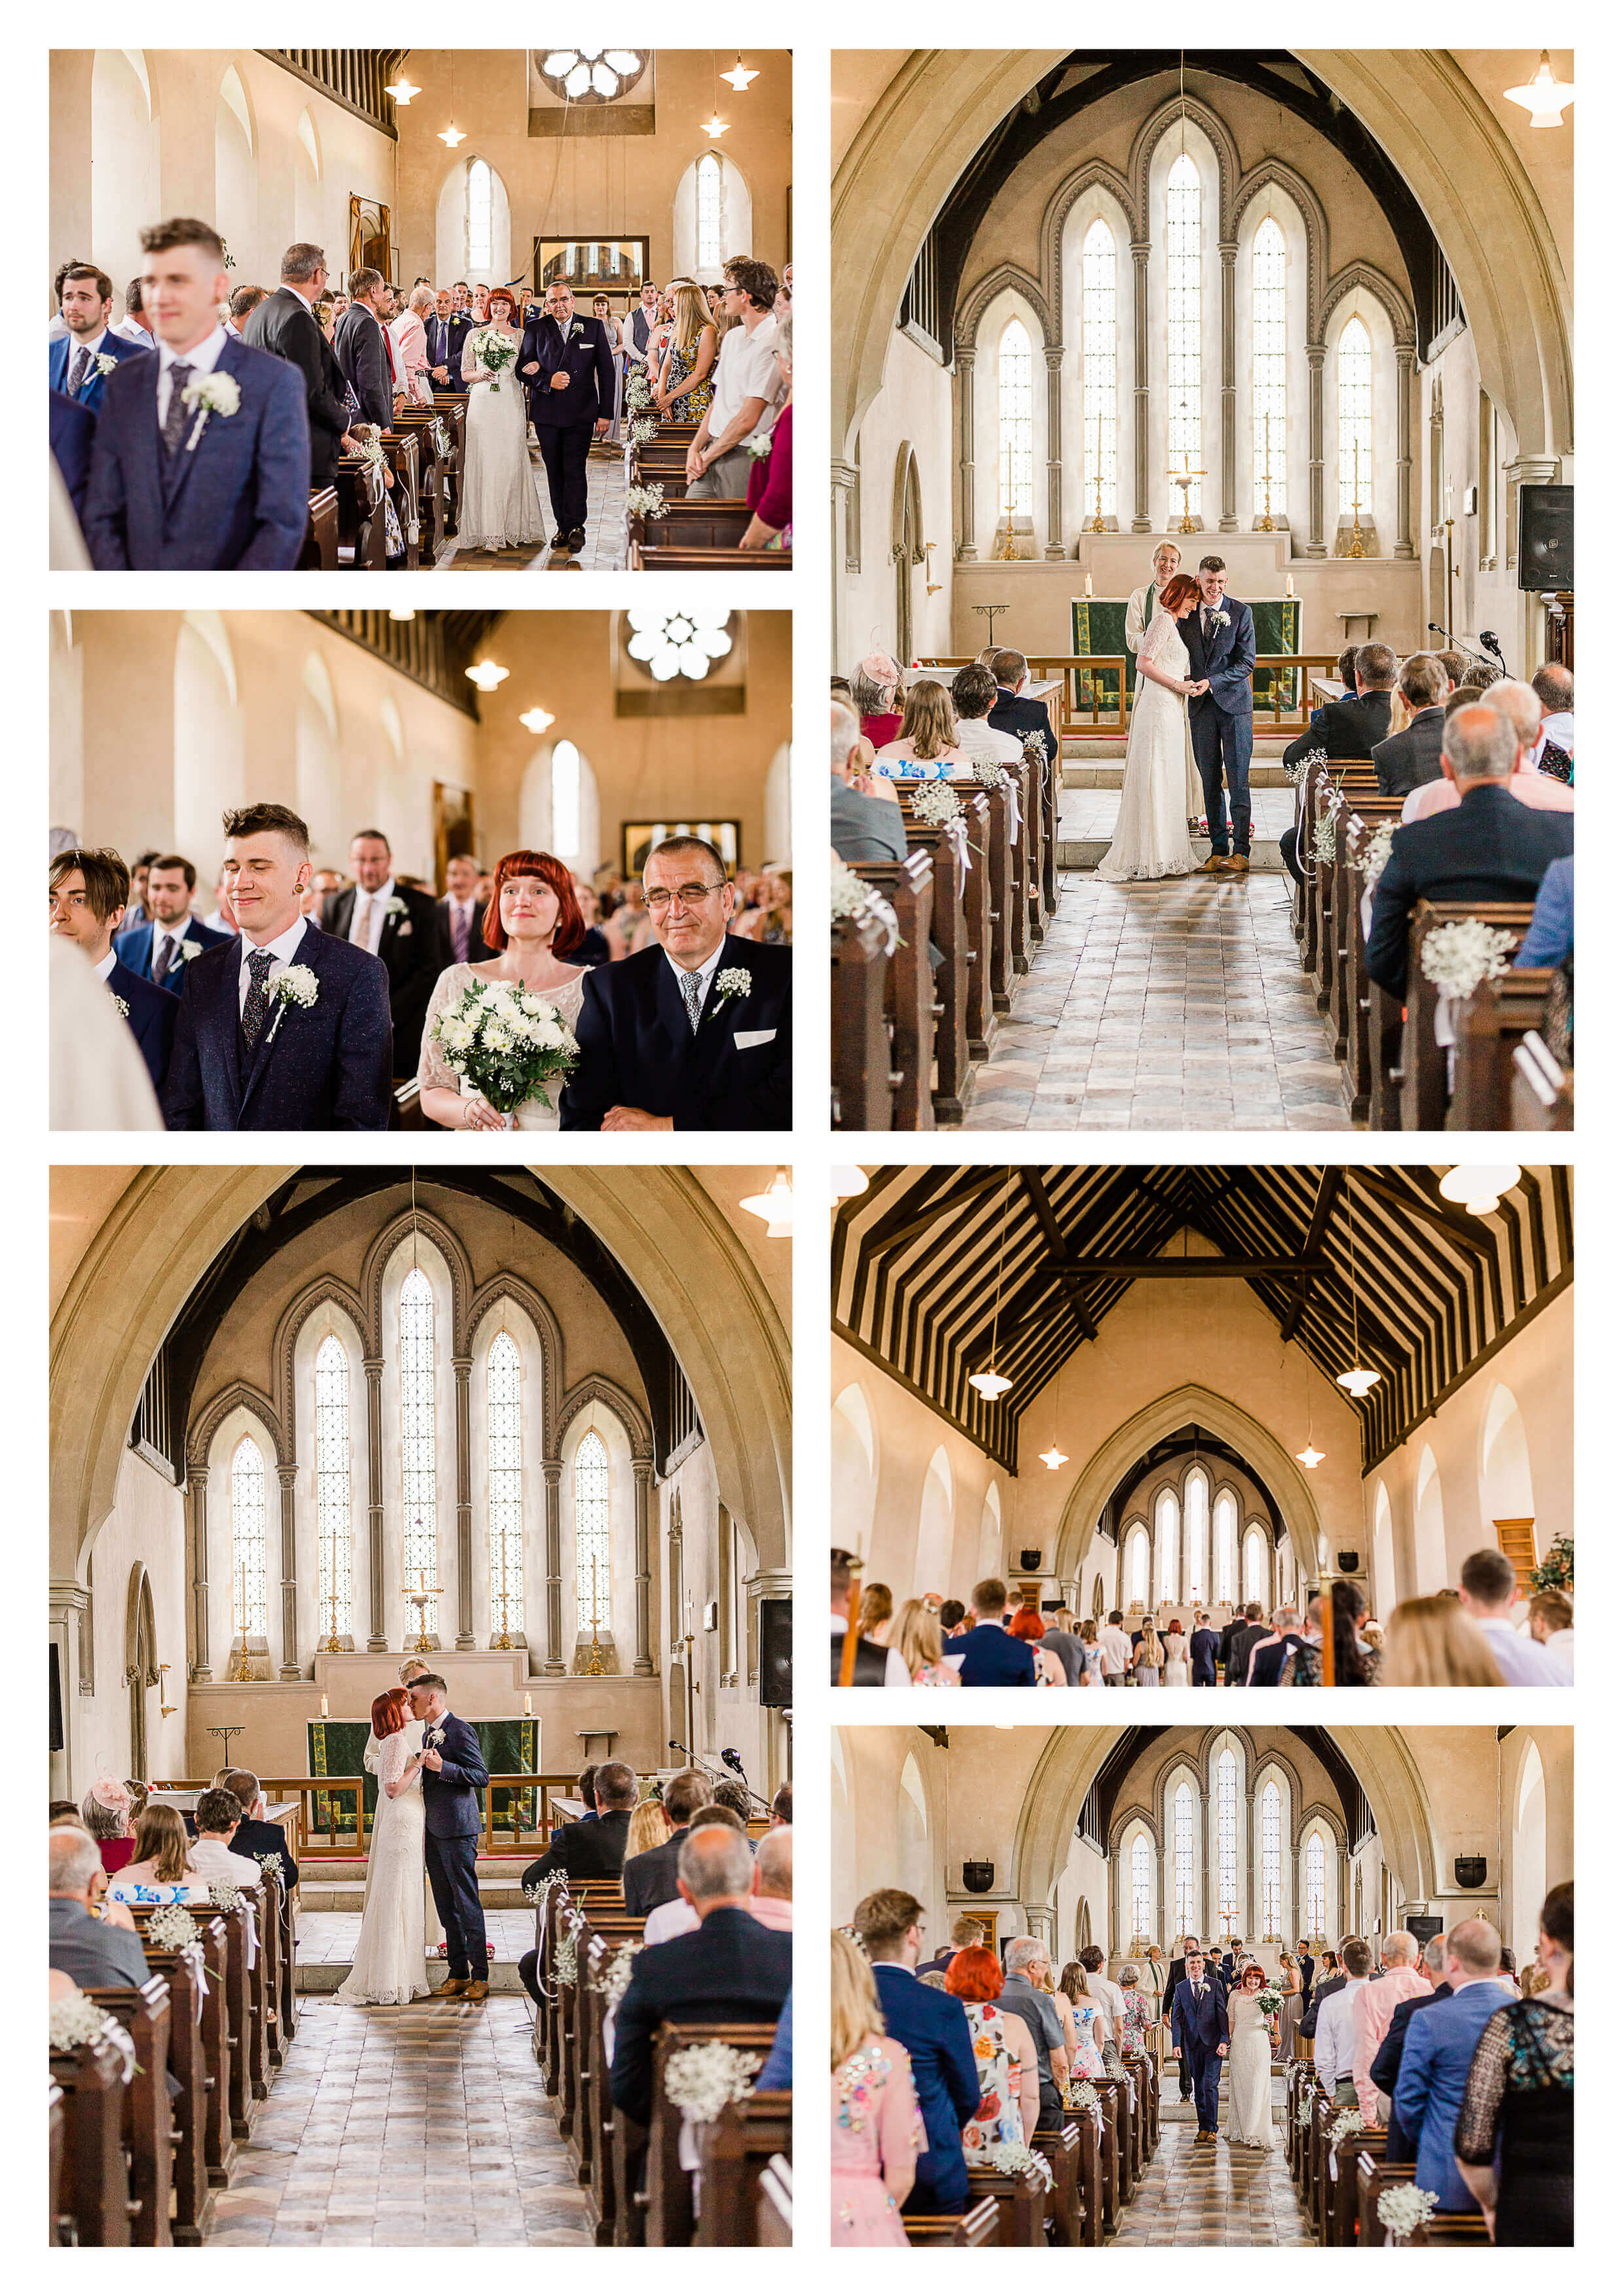 St. Luke's Church wedding ceremony venue in Guildford | Surrey Wedding Photographer